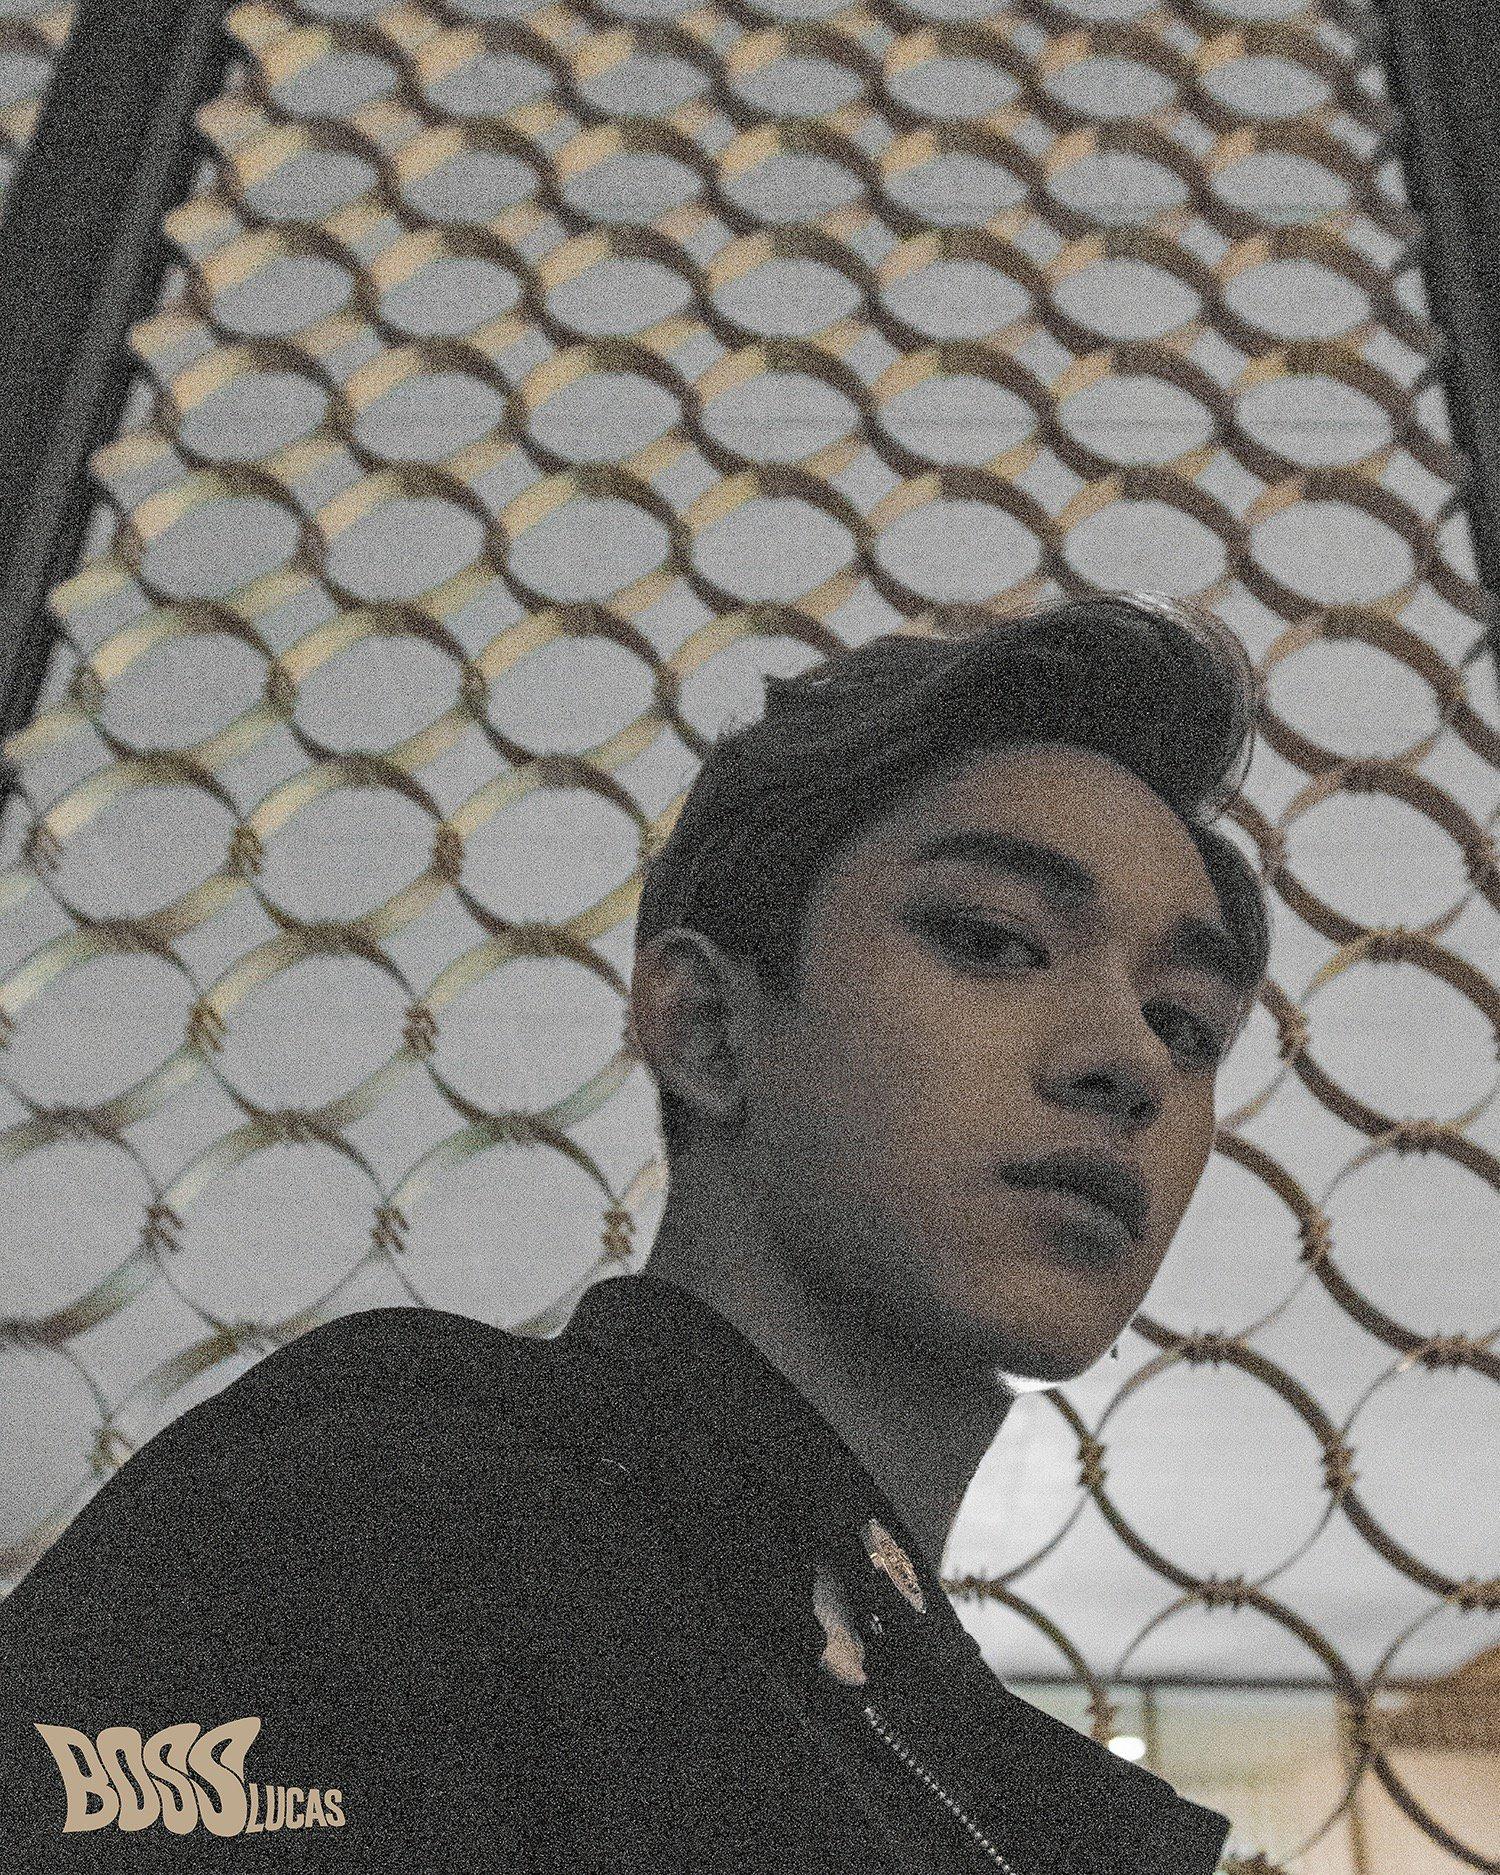 Update Nct U Reveals Individual Teaser Images For Boss Soompi